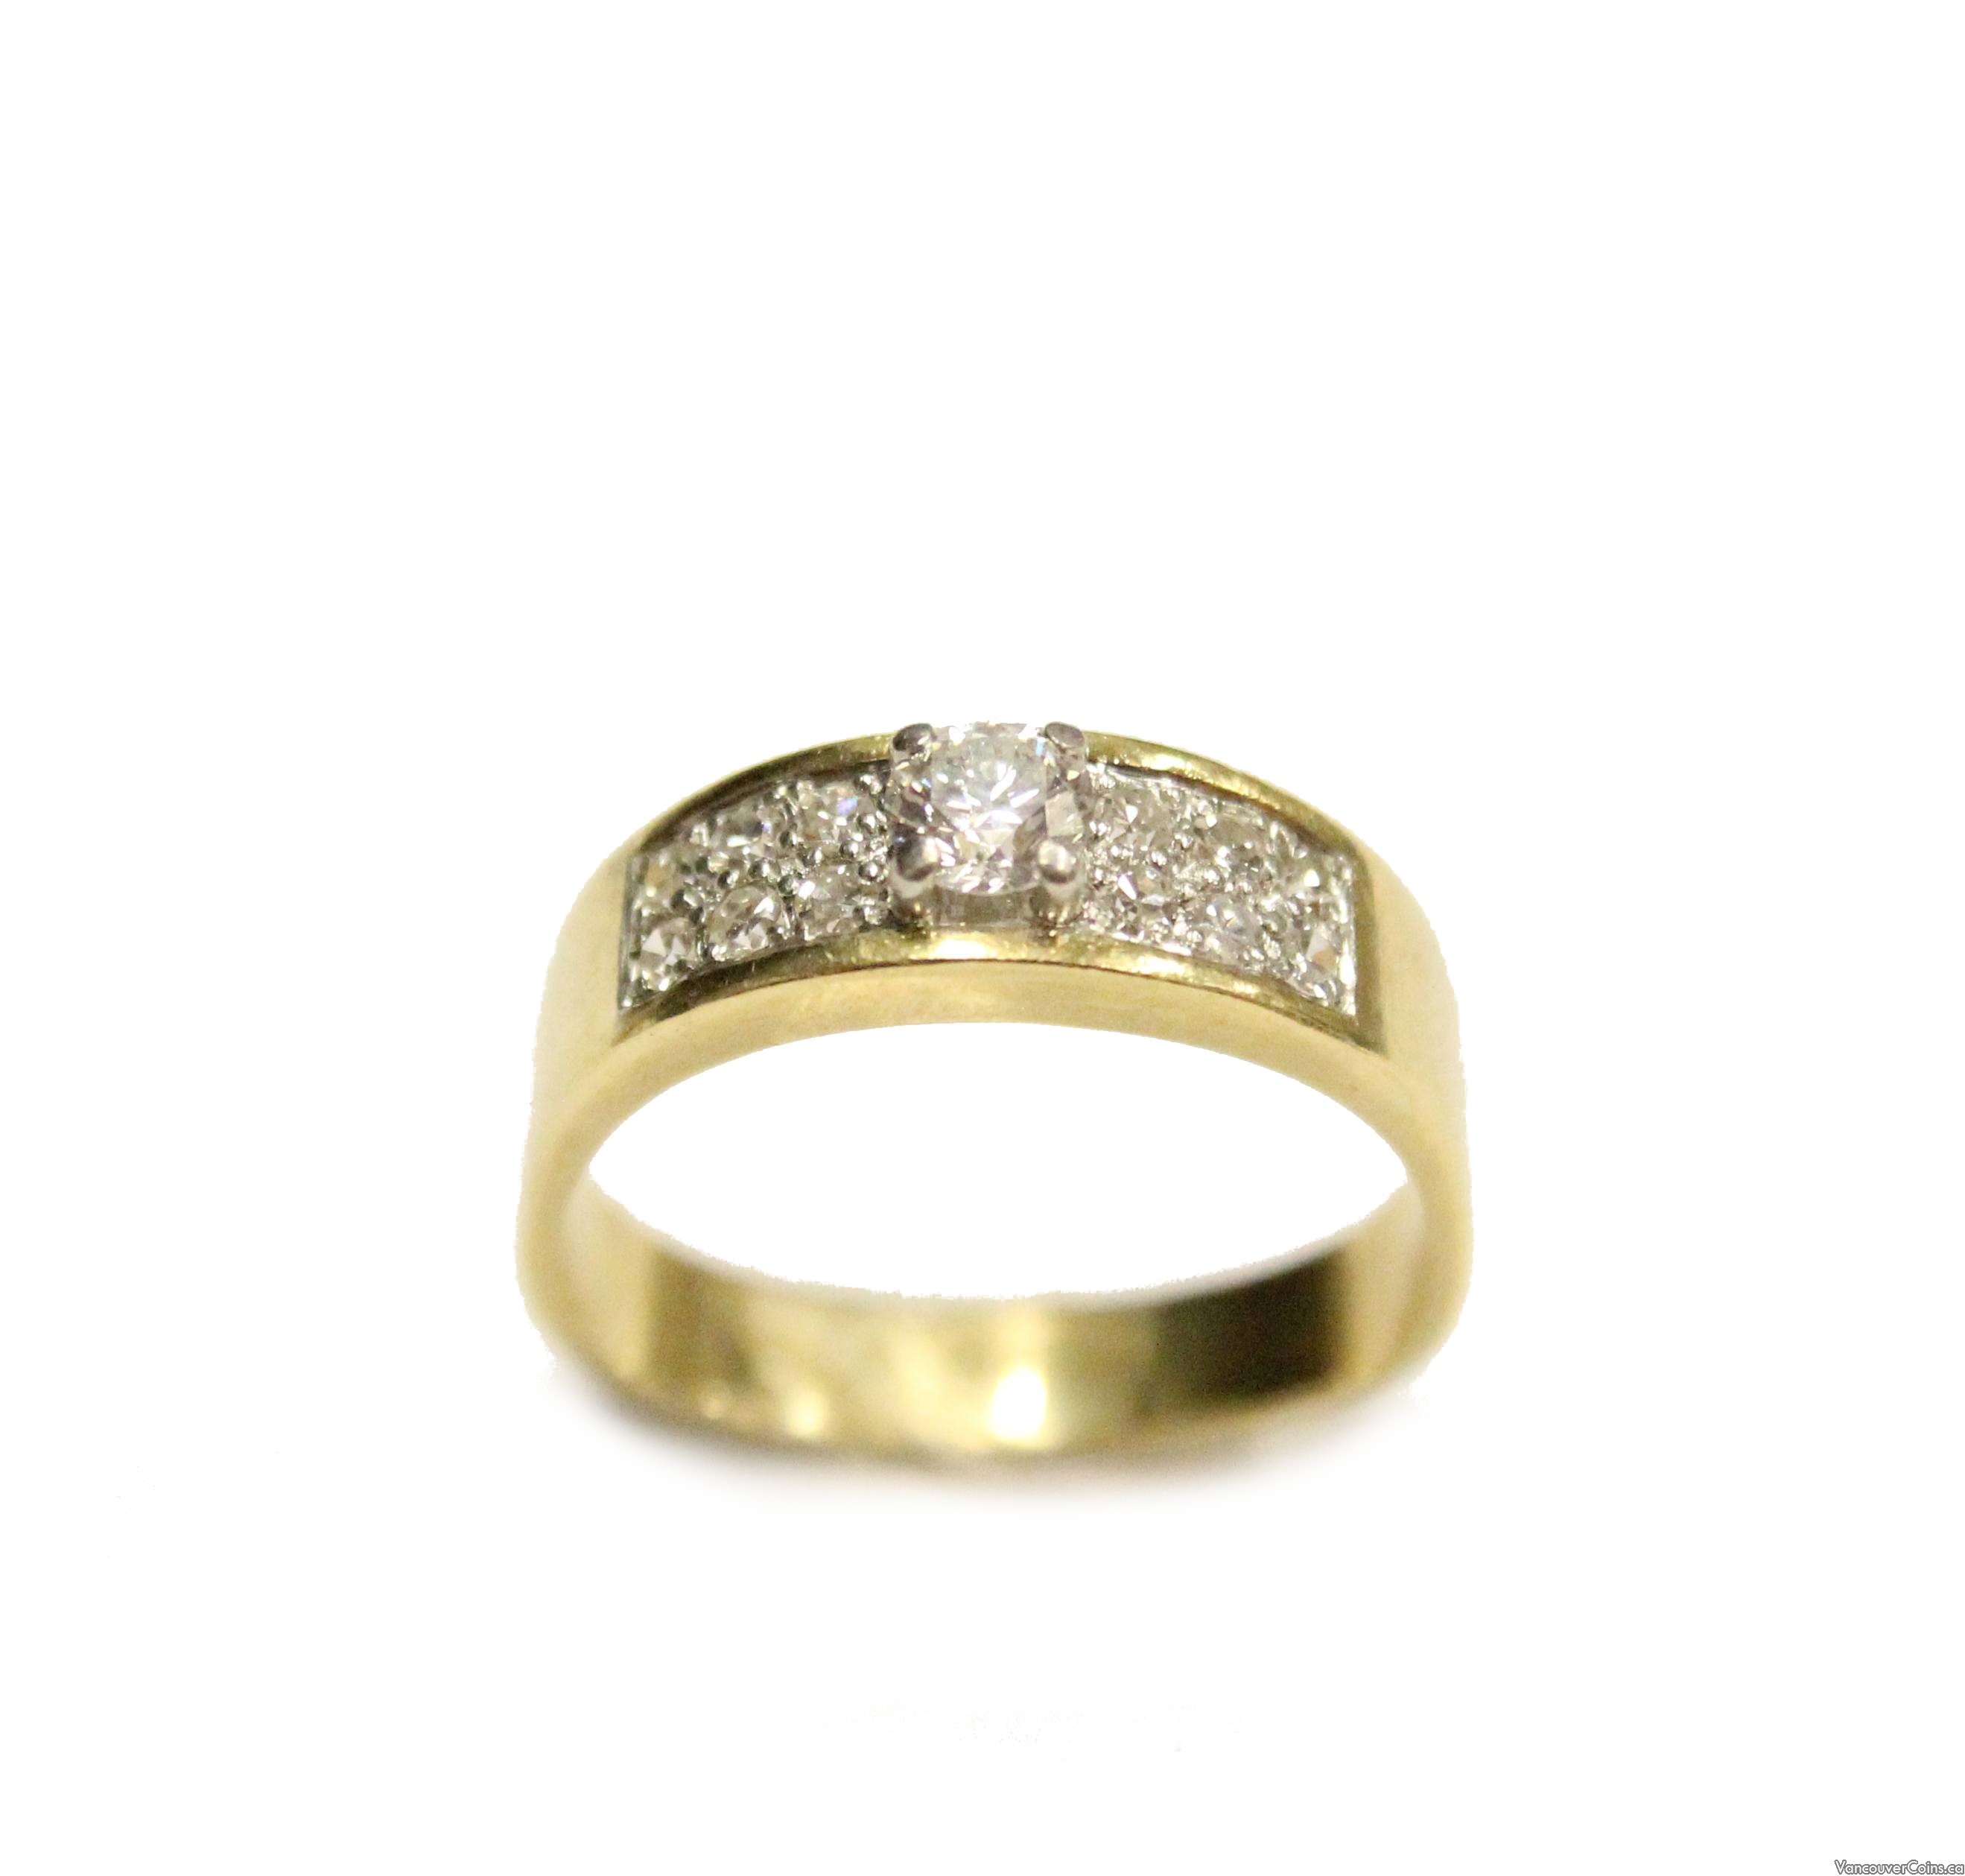 CAVELTI 18K gold and platinum 0.76ct tcw Diamond ring